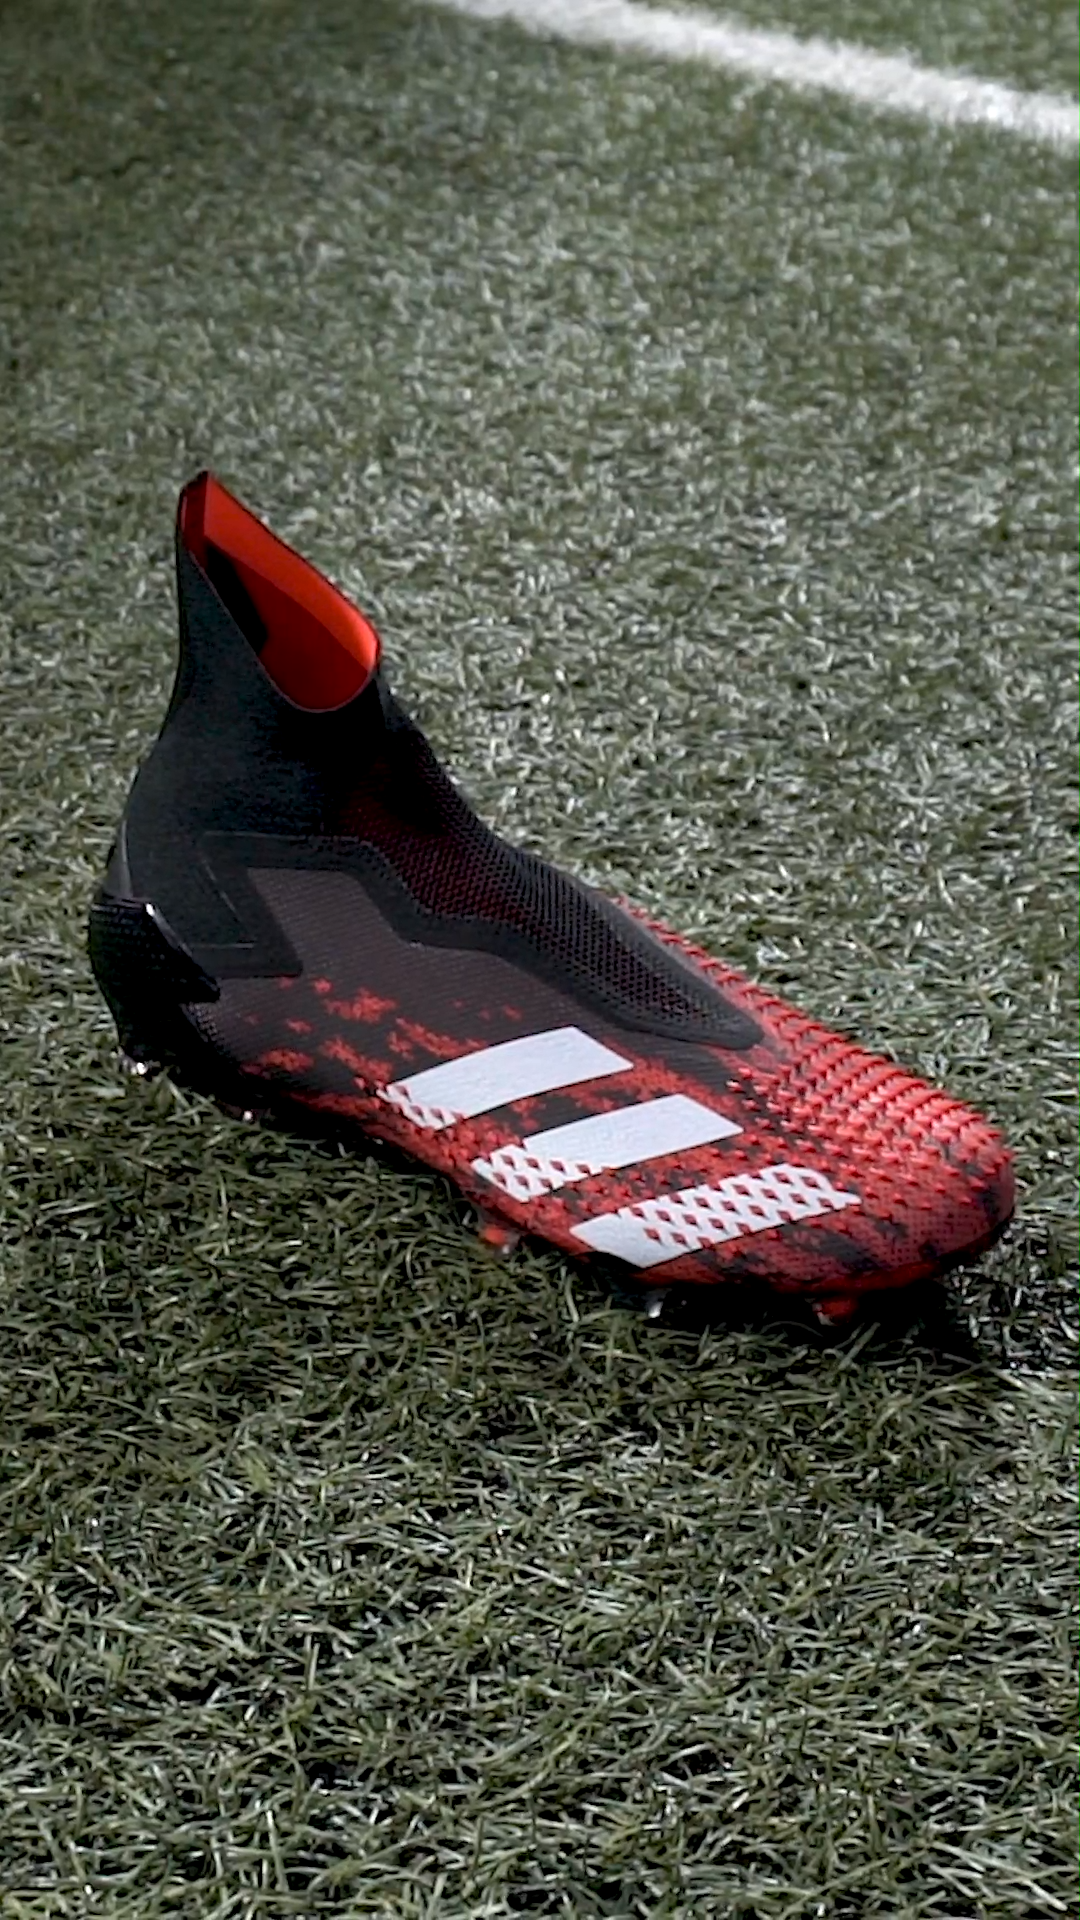 Adidas Predator Video Botas De Fútbol Adidas Zapatillas Adidas Futbol Botines De Futbol Adidas